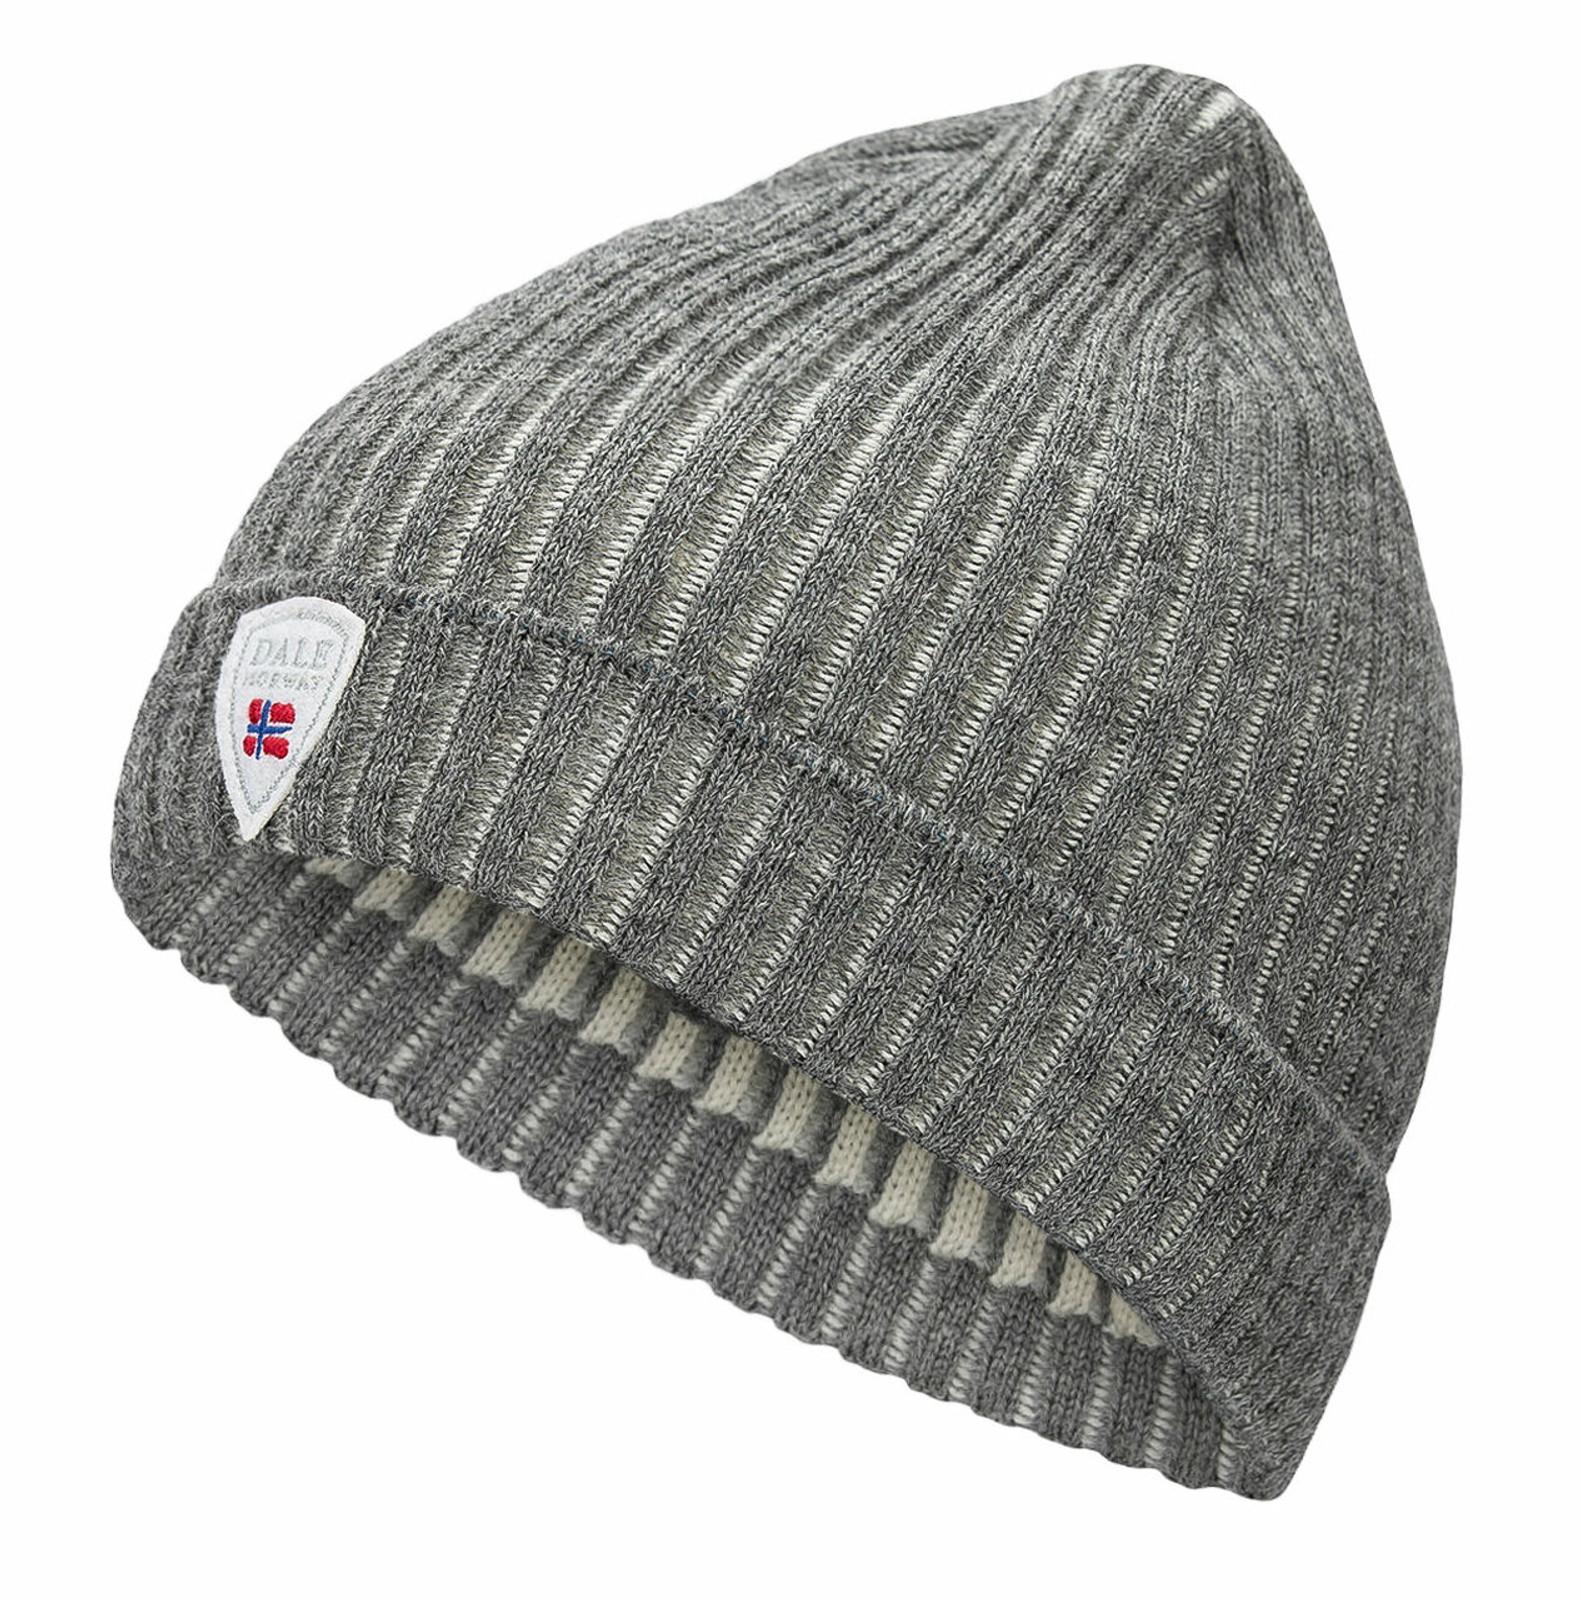 Dale of Norway Alvoy Hat, Smoke, 48931E